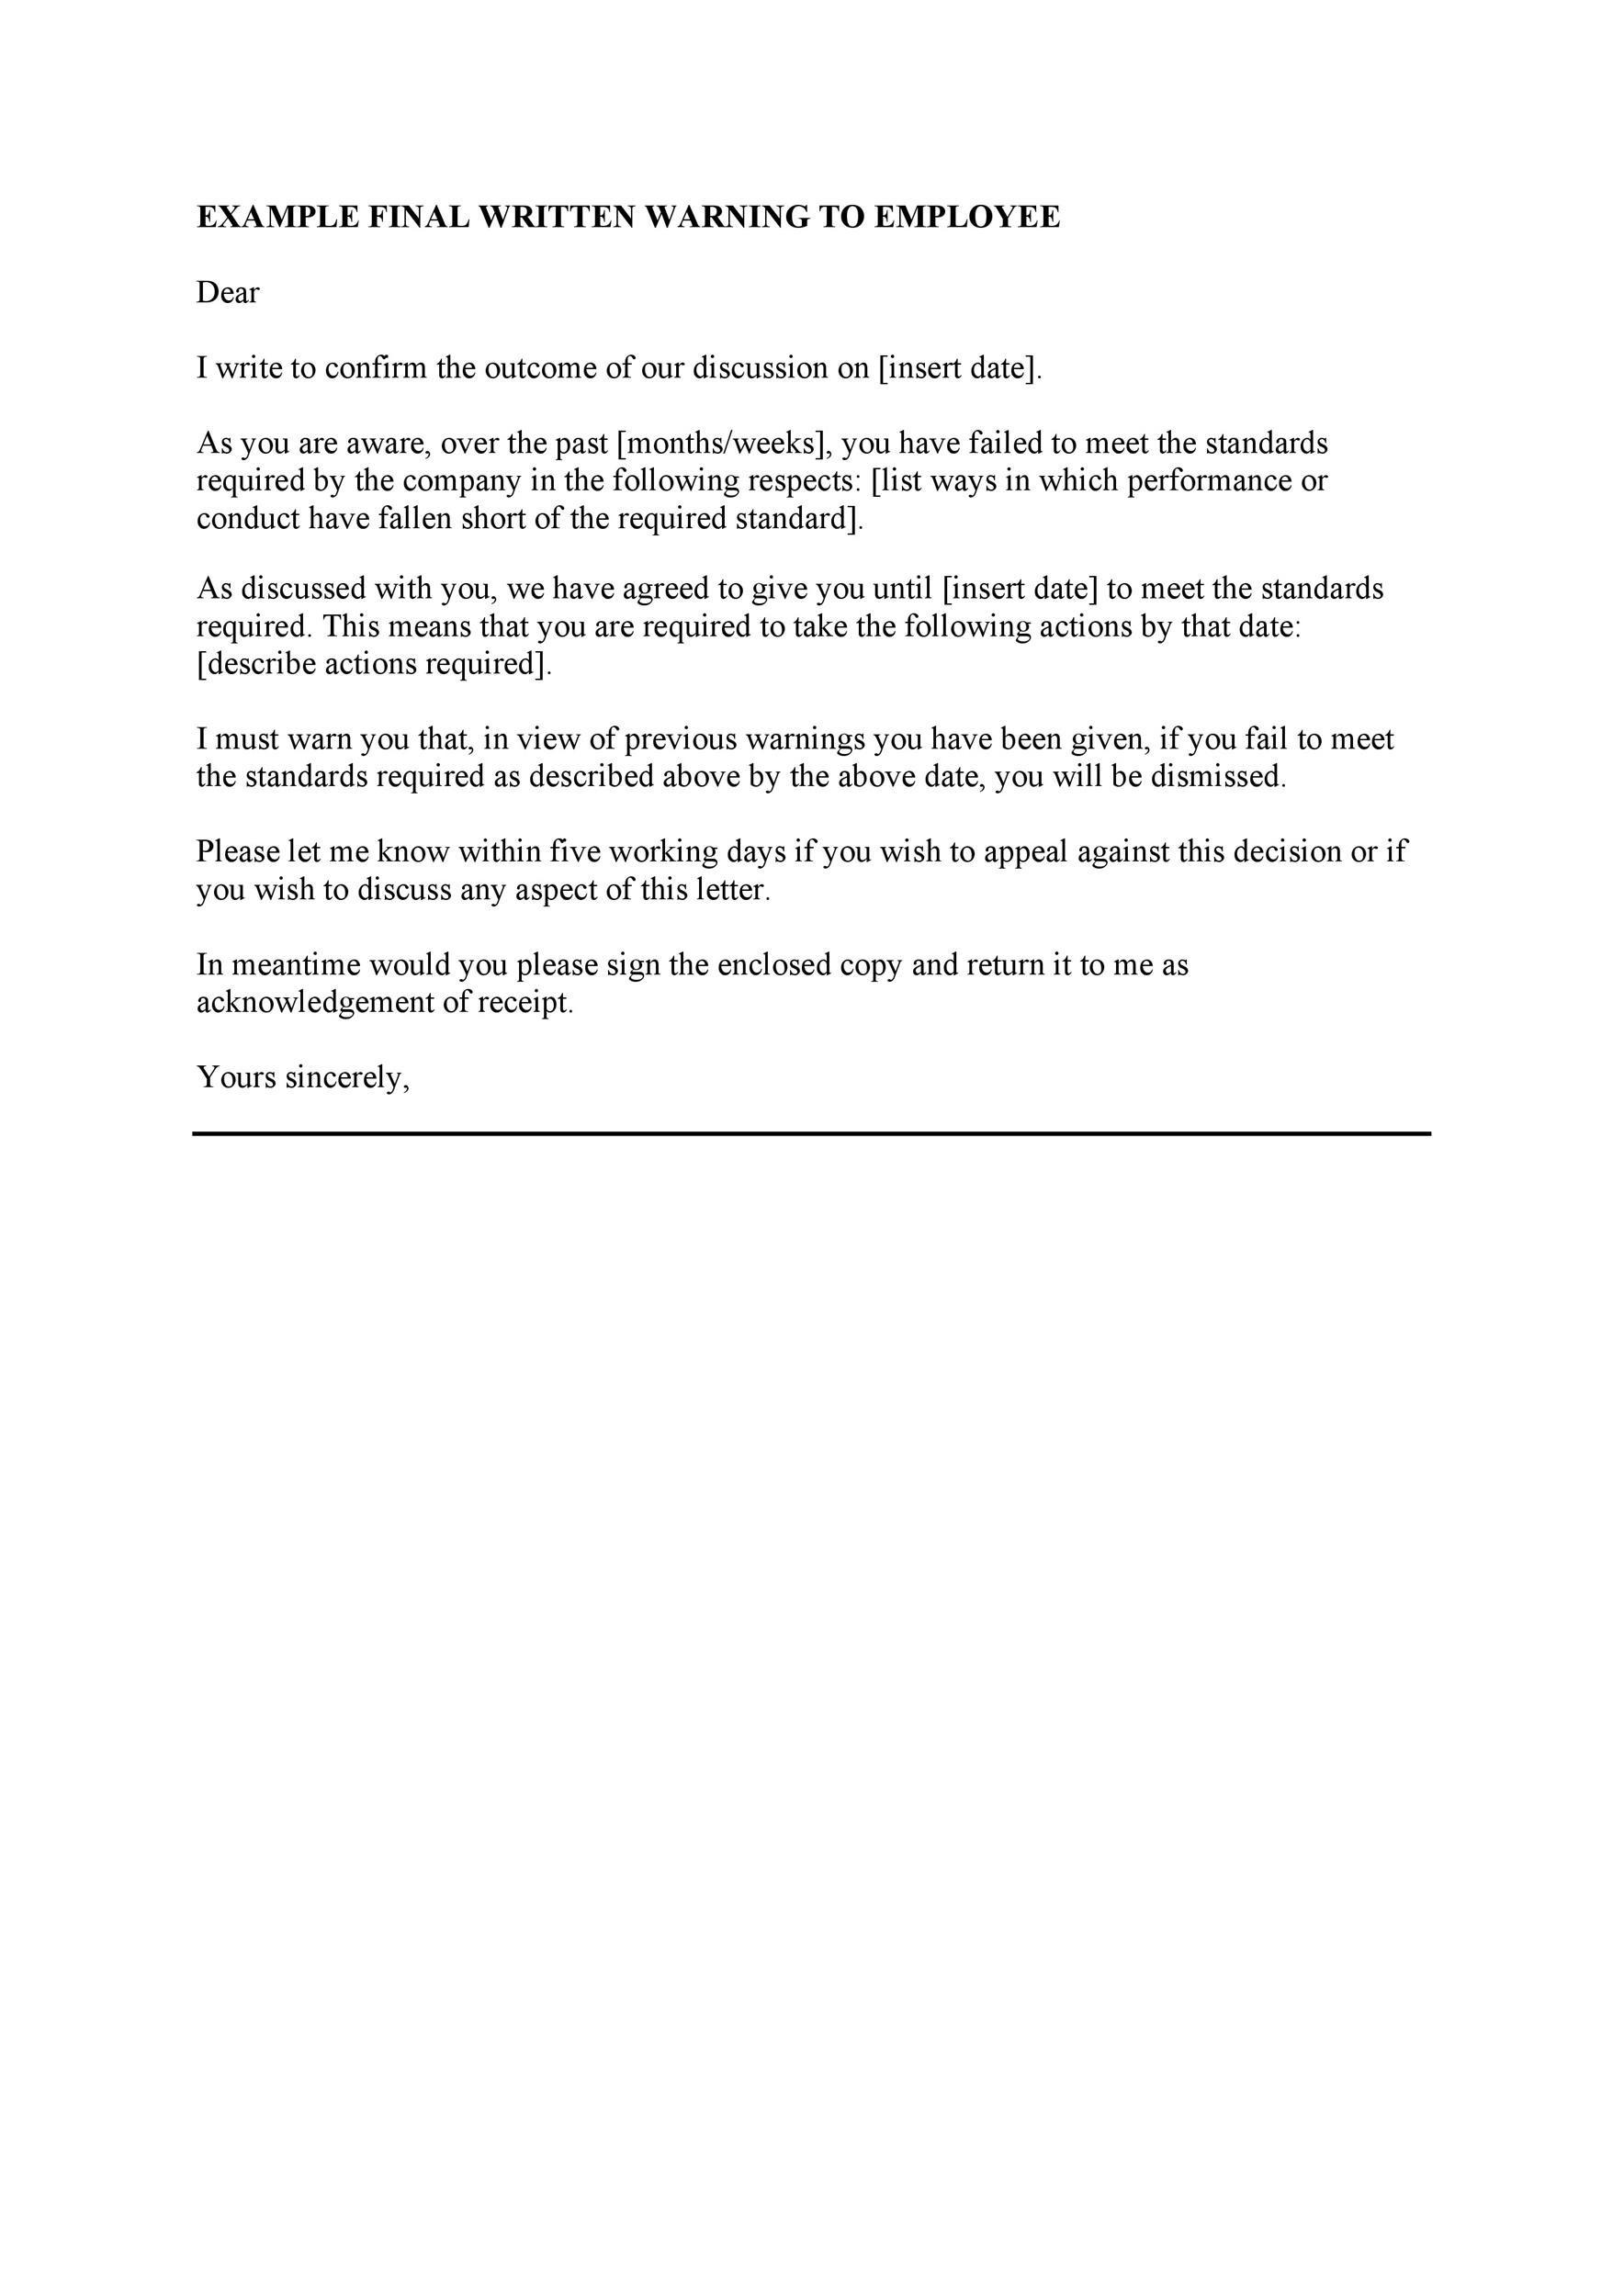 Free employee warning letter 12